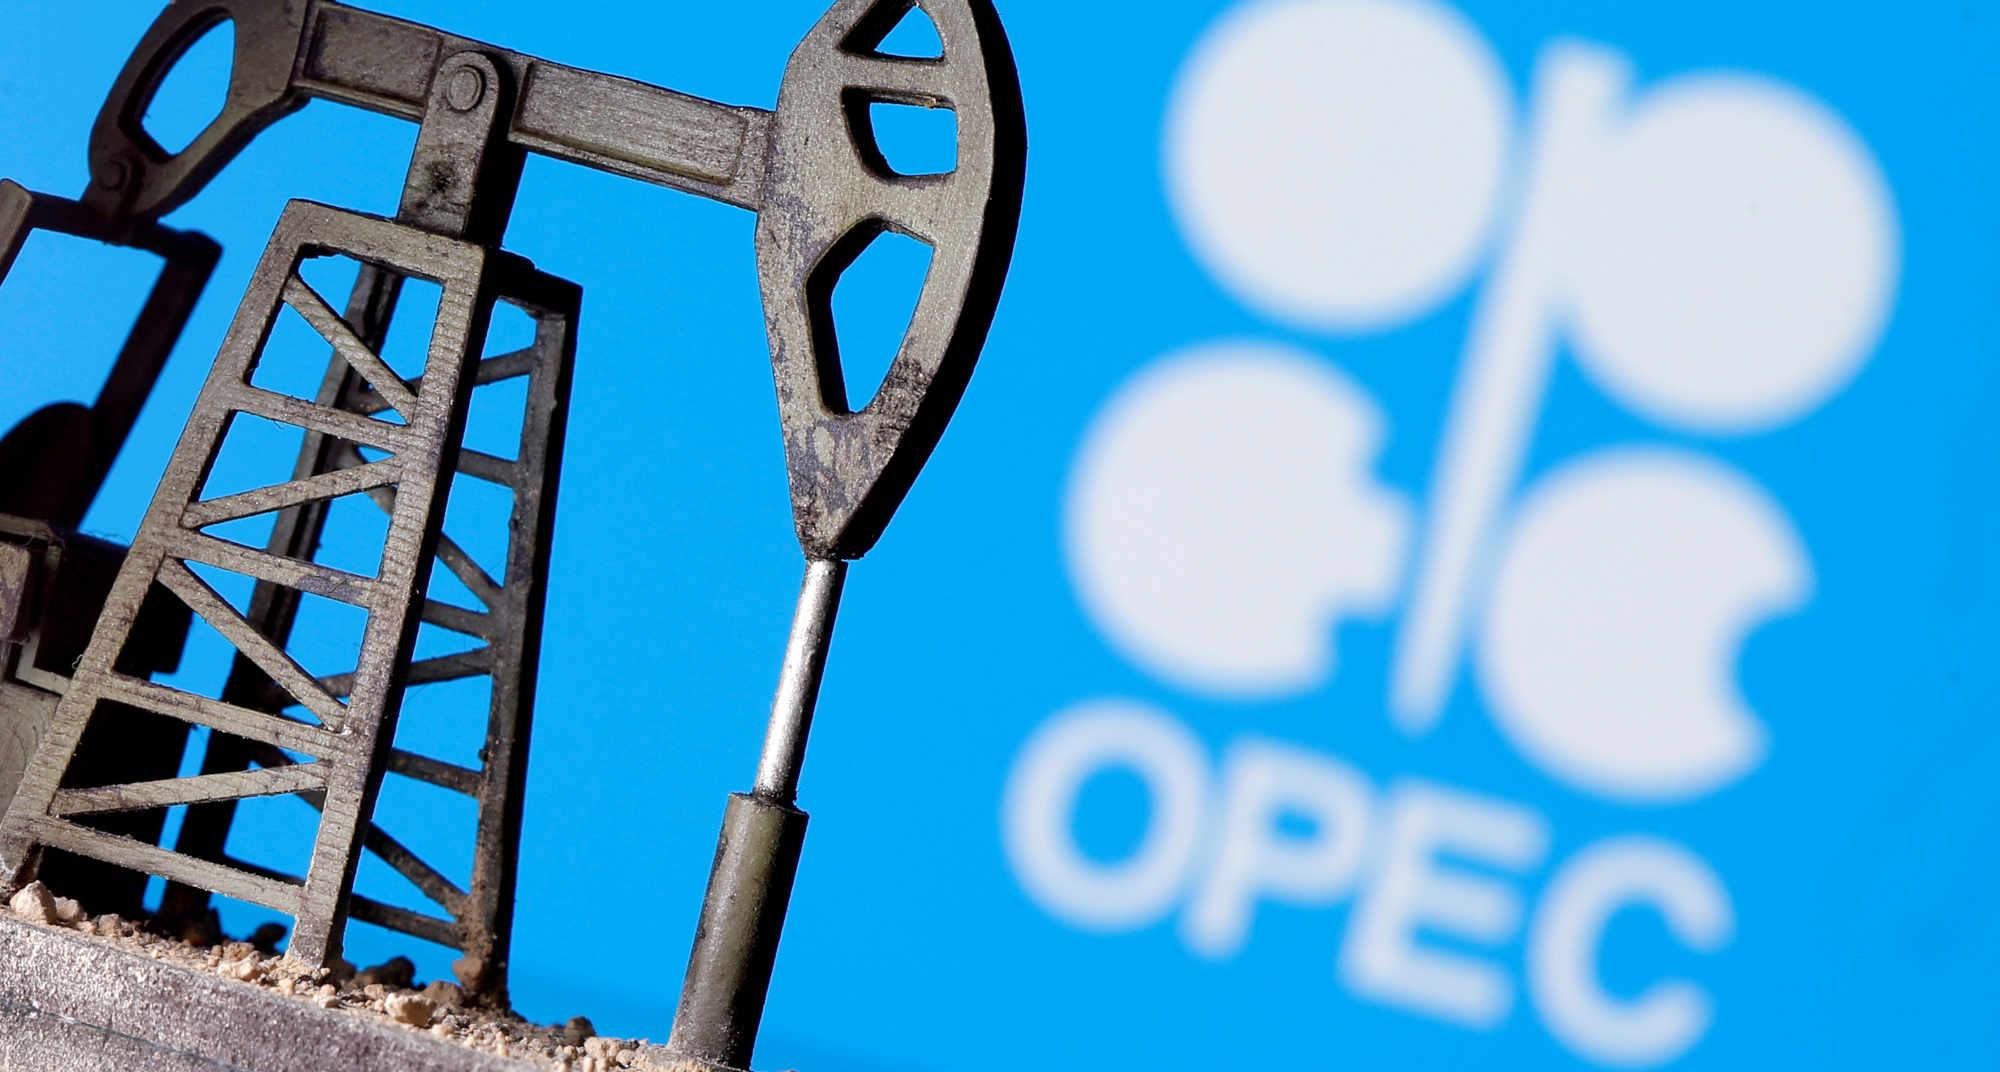 petróleo OPEP+   business insider méxico